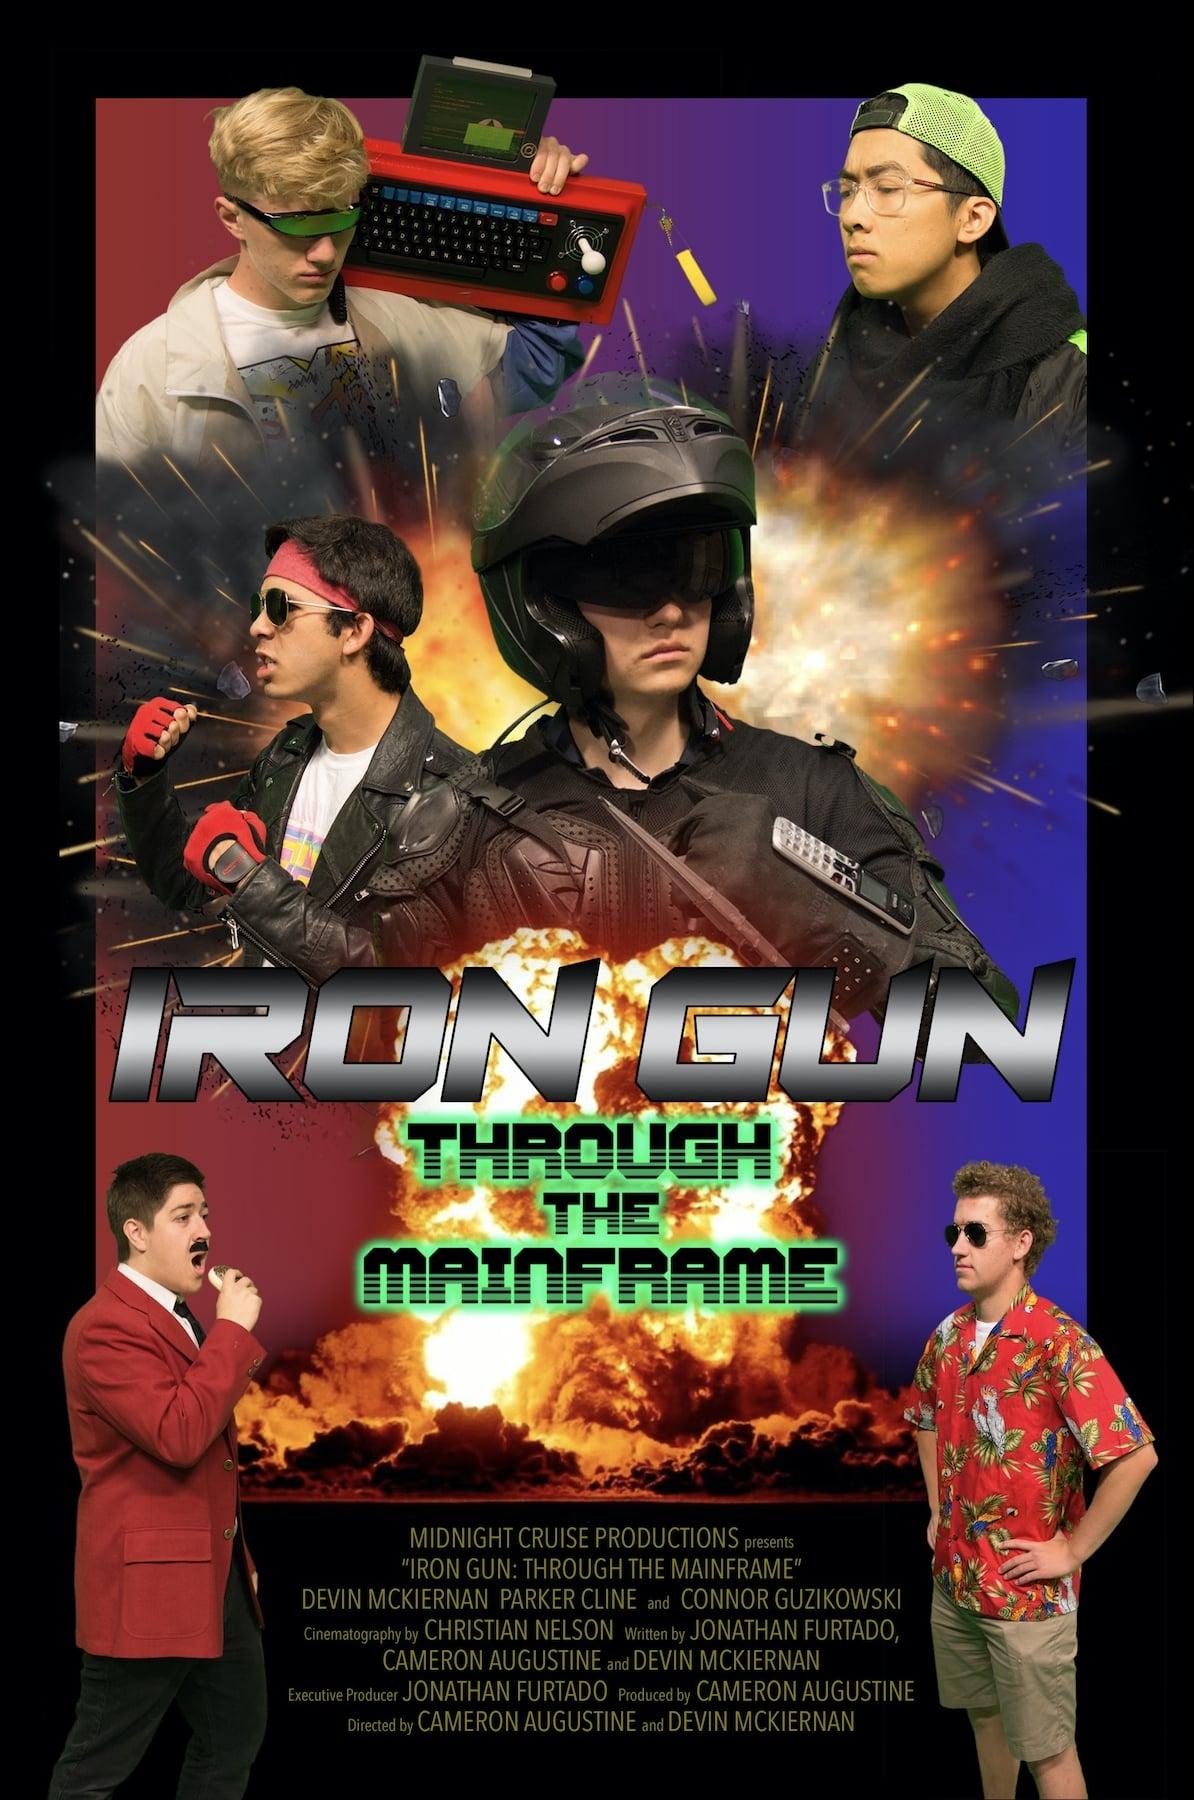 Iron Gun: Through The Mainframe